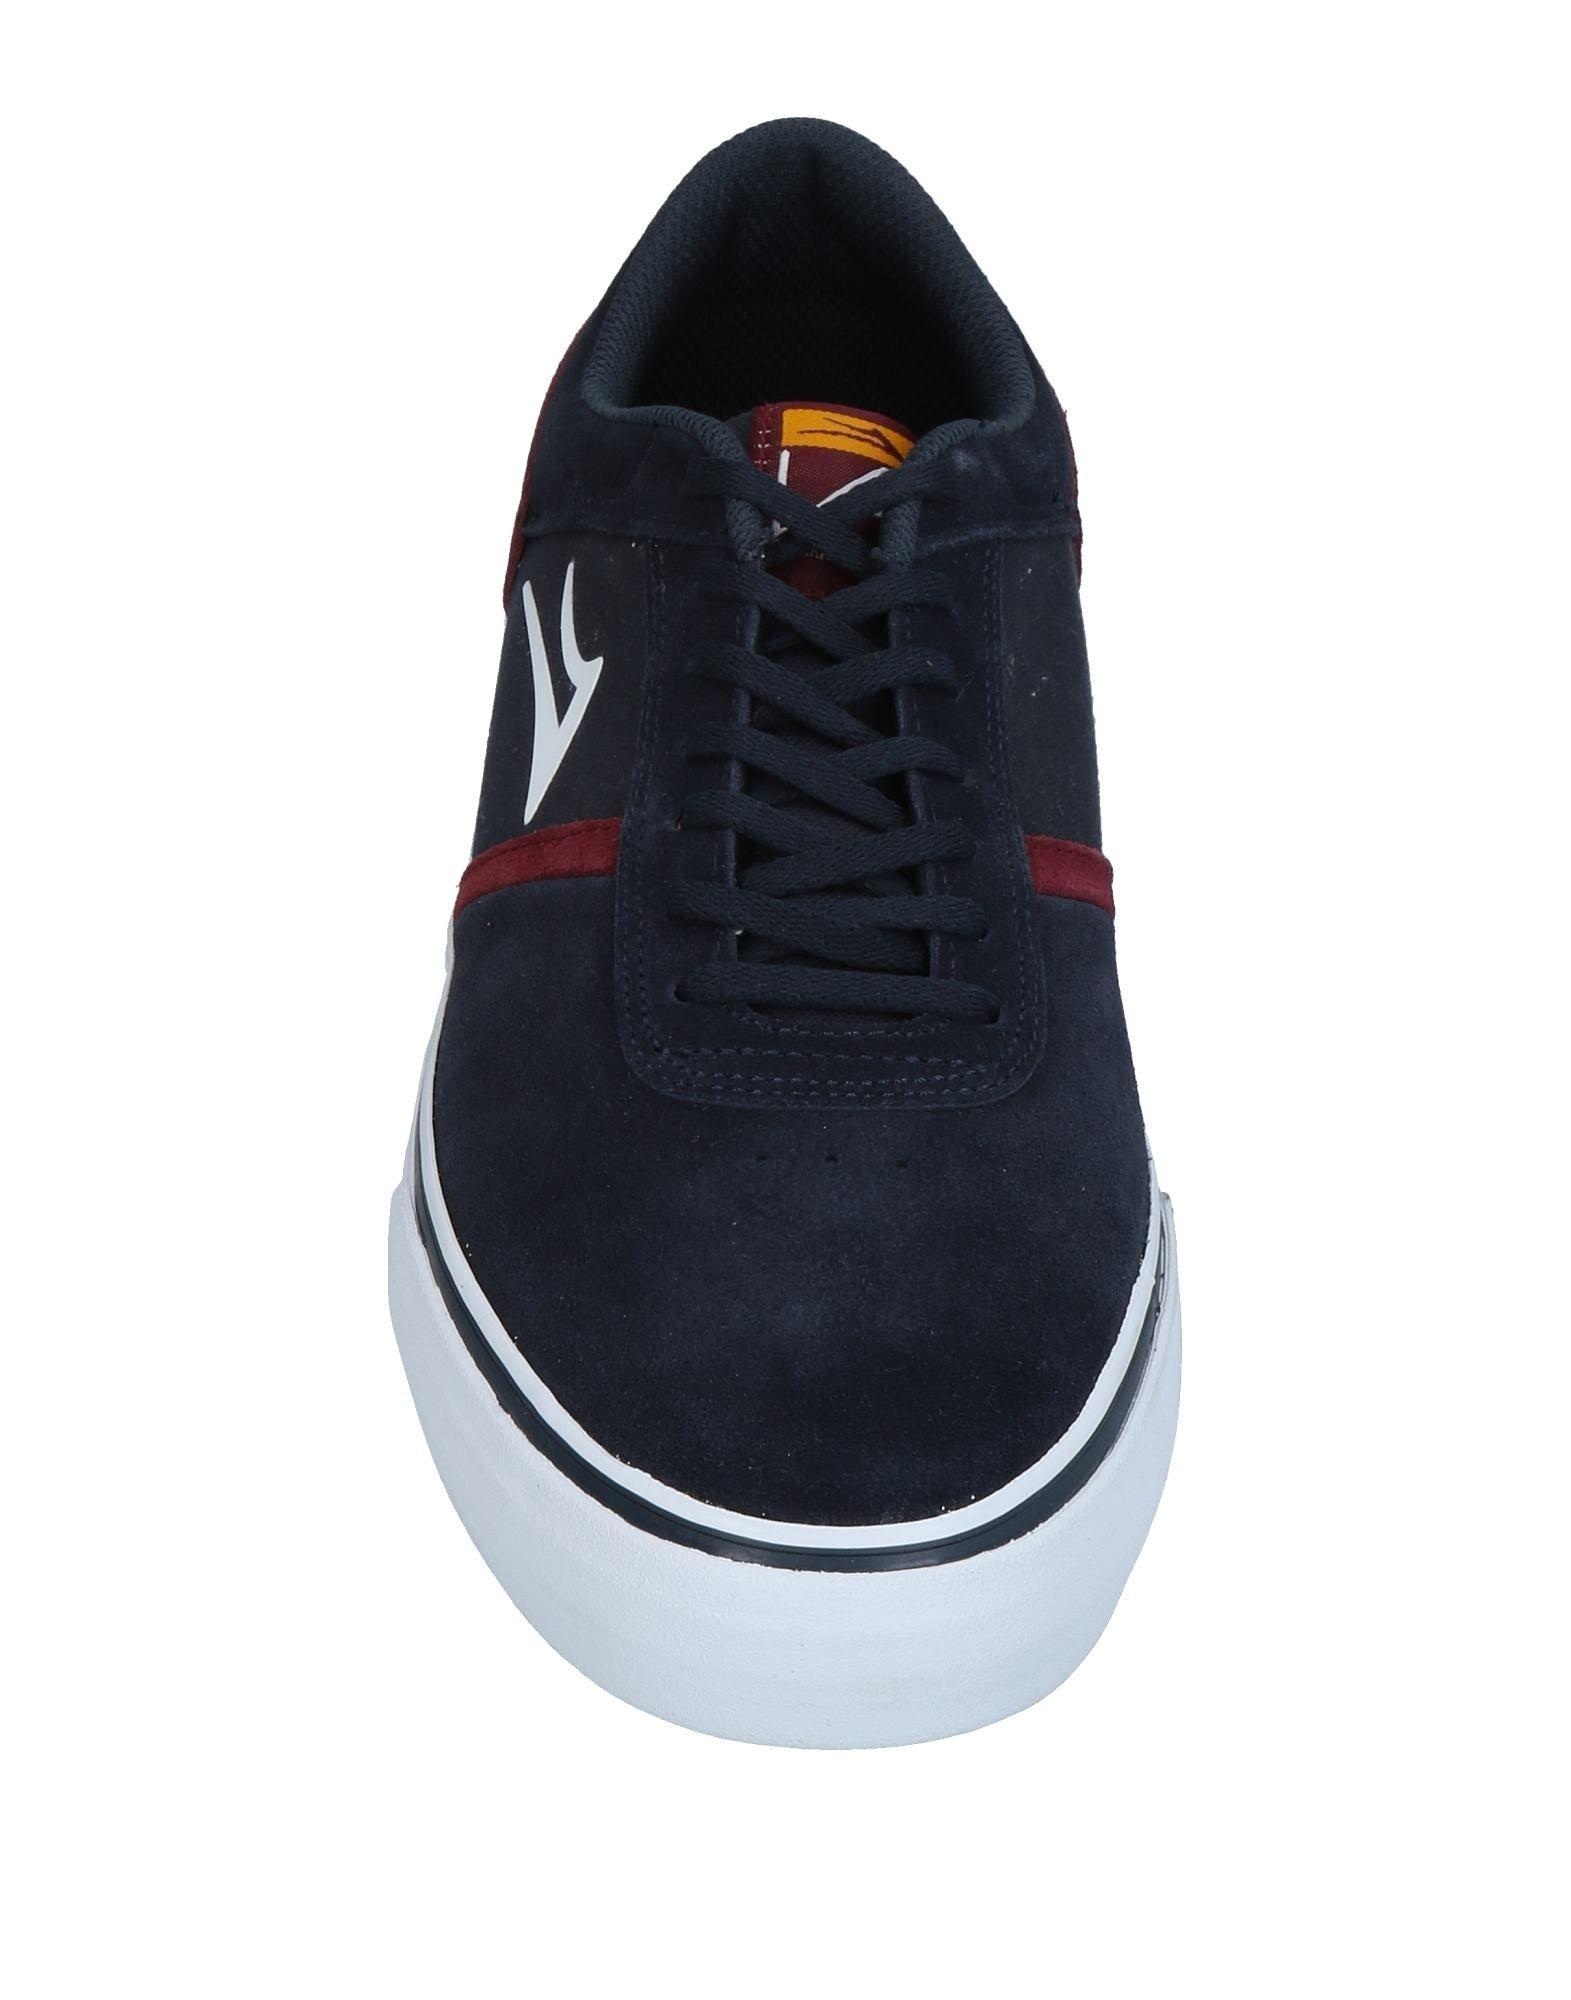 Lakai Suede Low-tops & Sneakers in Dark Blue (Blue) for Men